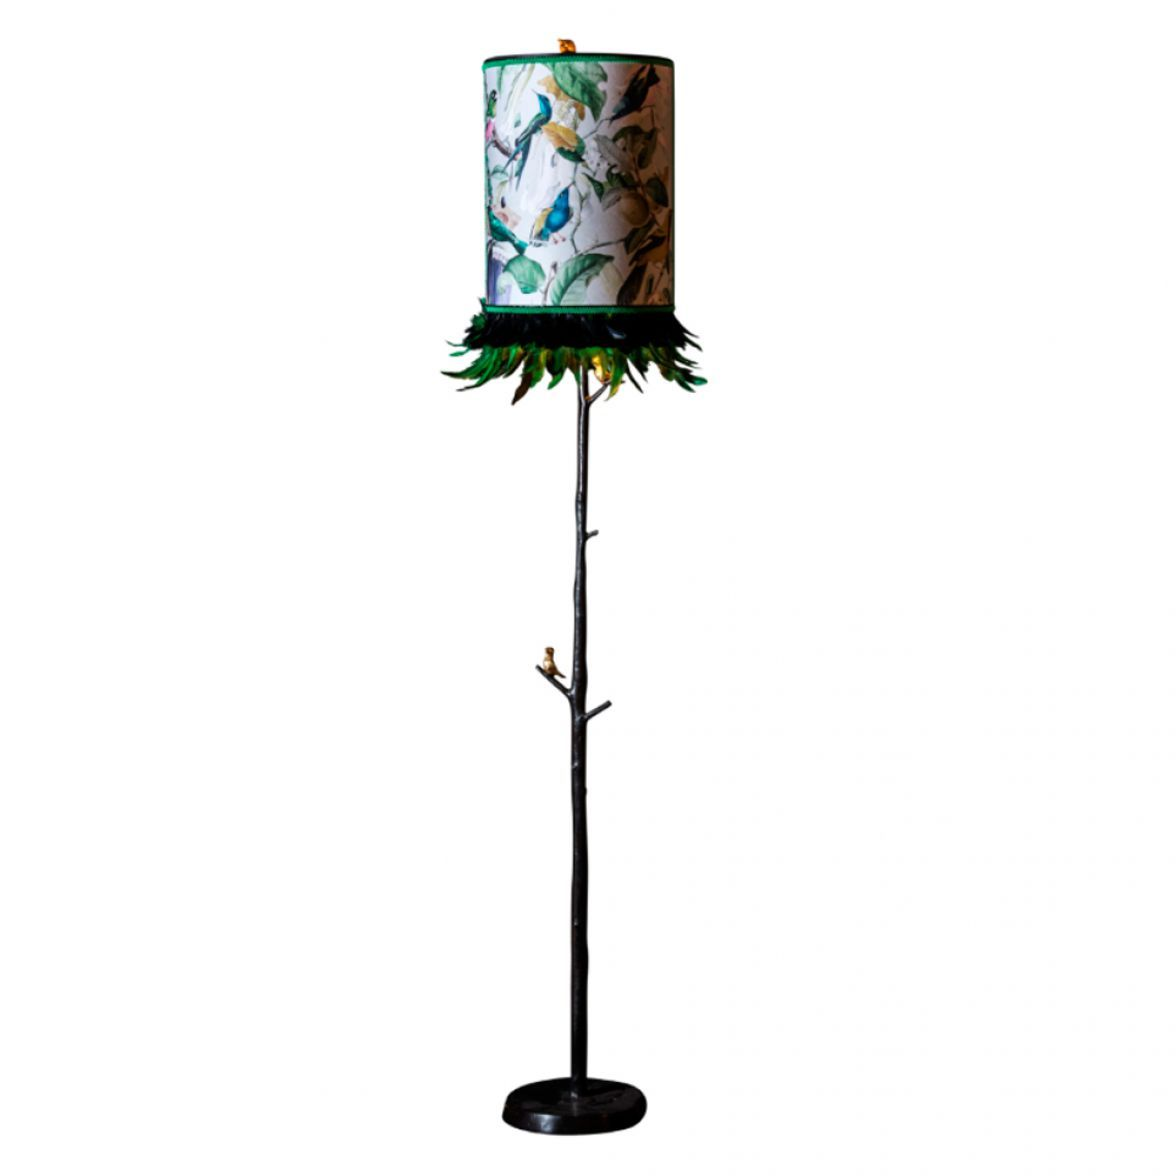 Birdy's Or Floor lamp